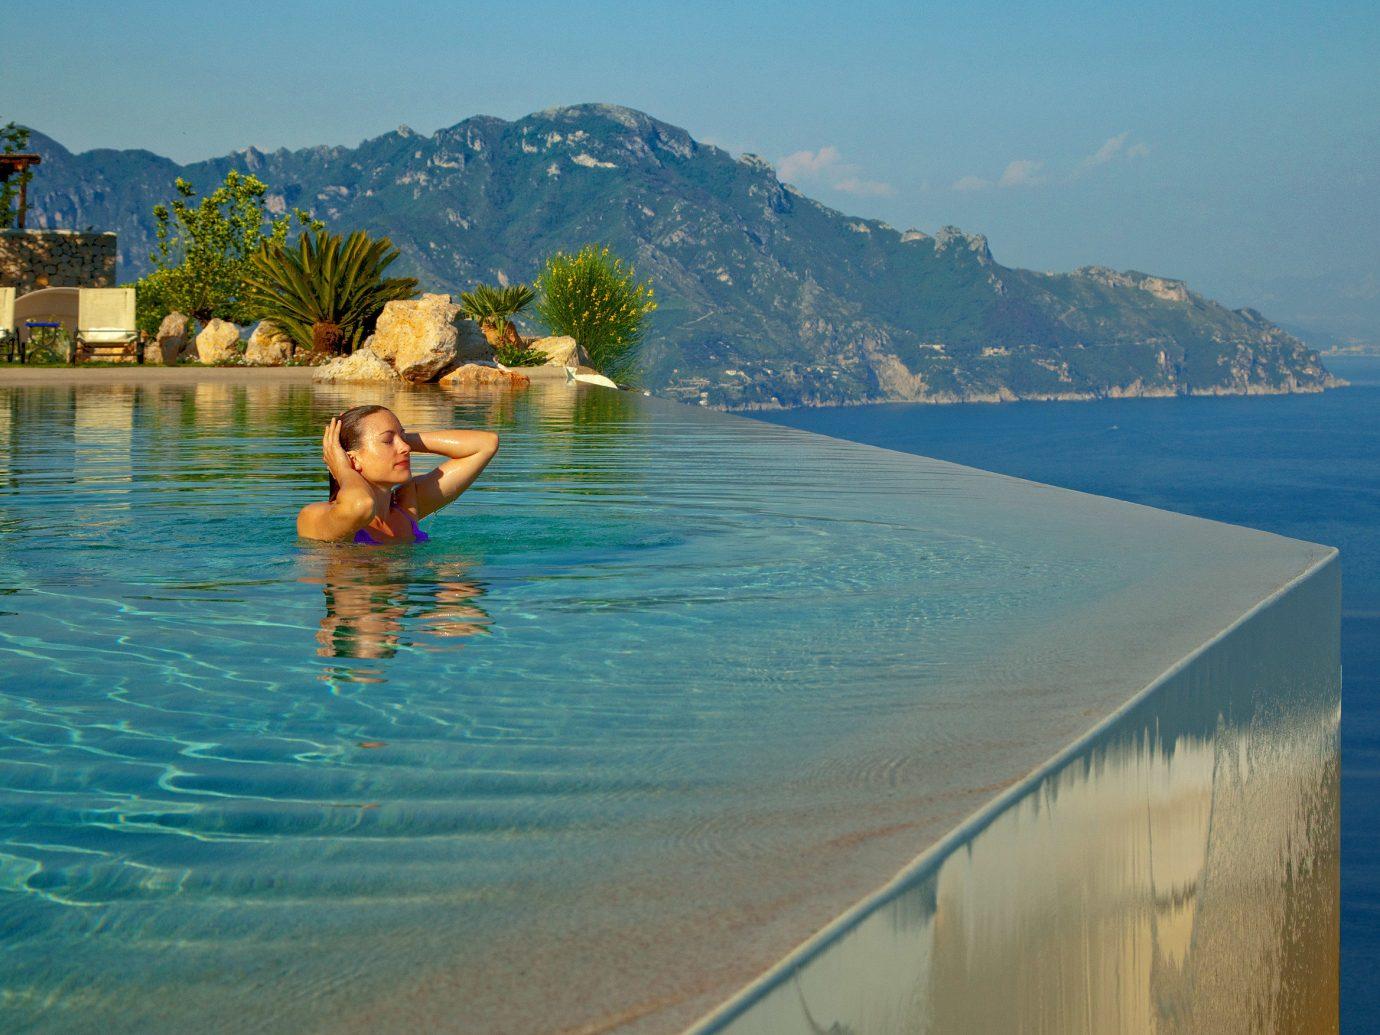 infinity pool at Monastero Santa Rosa, Conca dei Marini